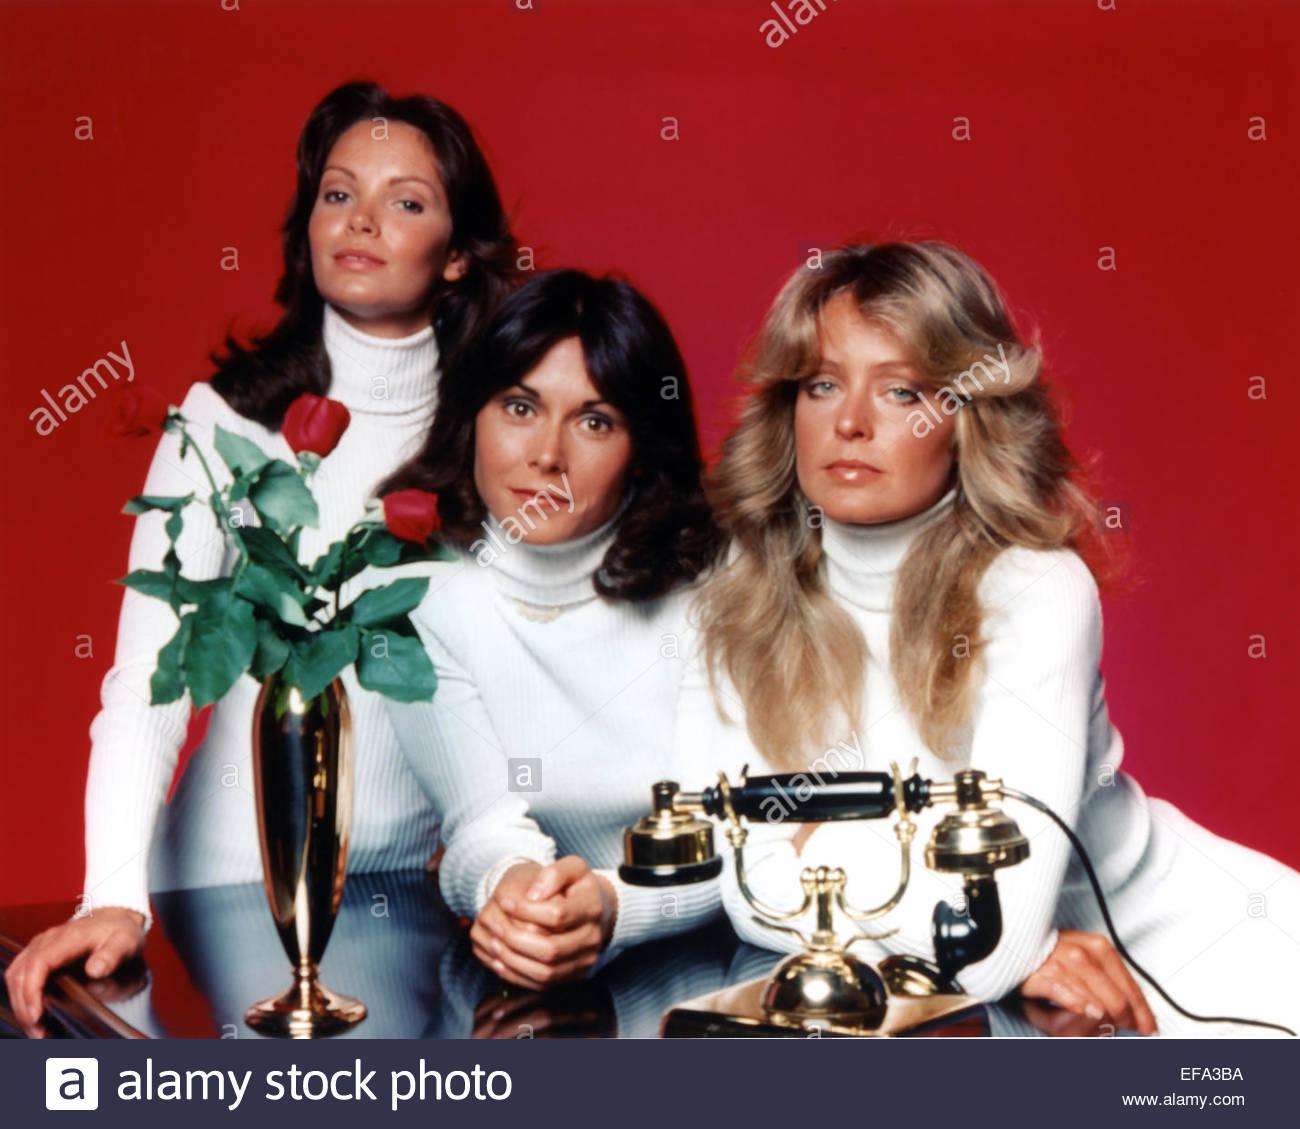 JACLYN SMITH, KATE JACKSON, FARRAH FAWCETT, CHARLIE'S ANGELS, 1976 - Stock Image